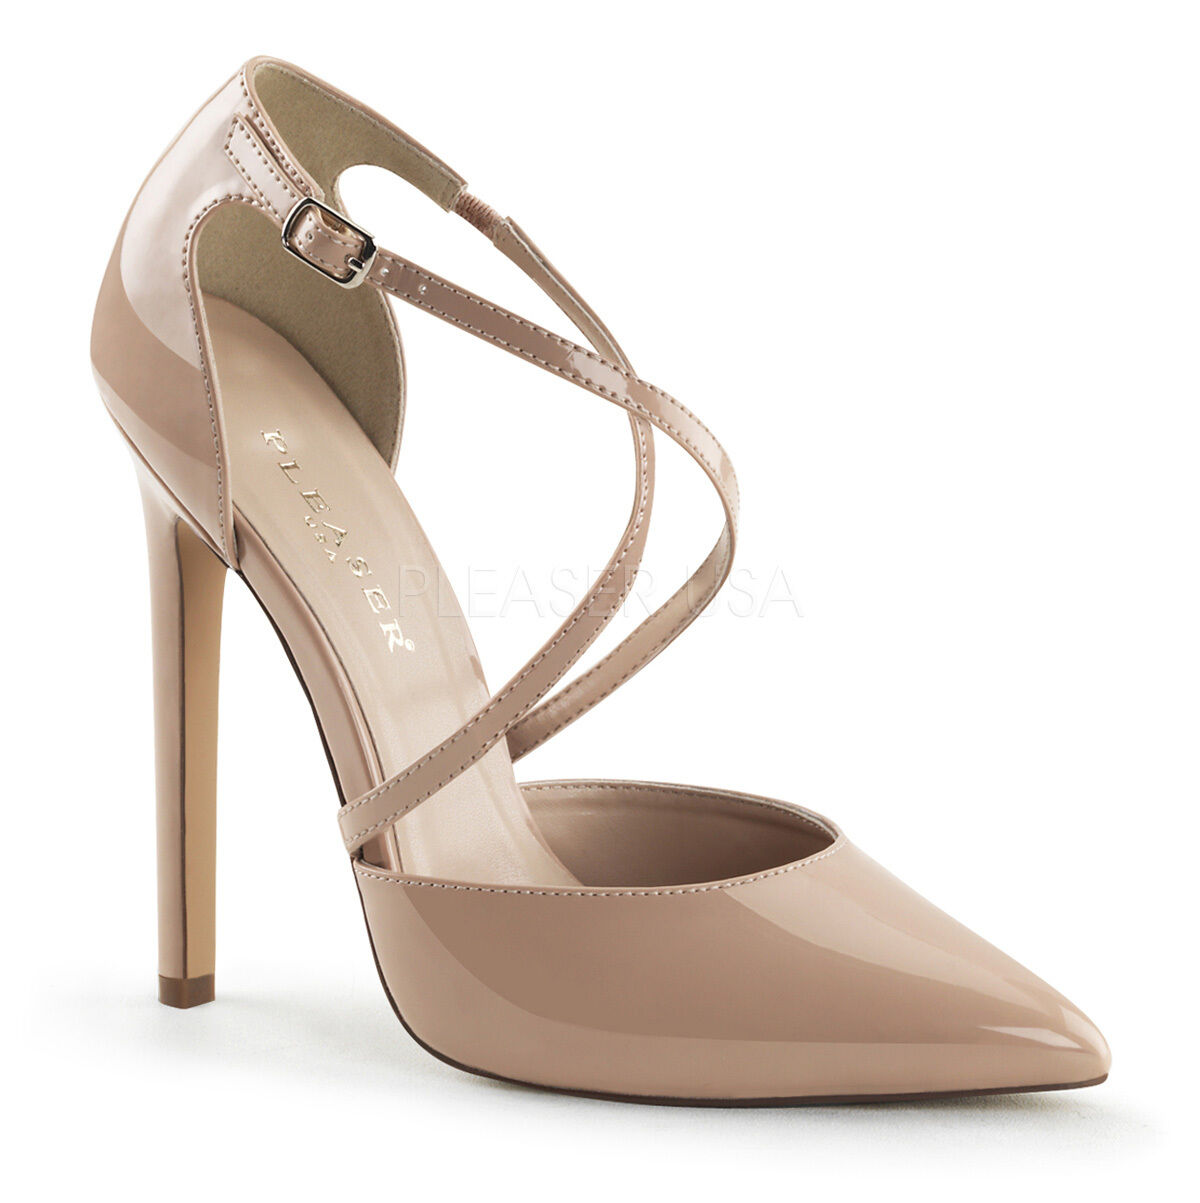 PLEASER SEXY26 NU Sexy Cream Stiletto 5  Heel Criss Cross Pumps High Heels shoes